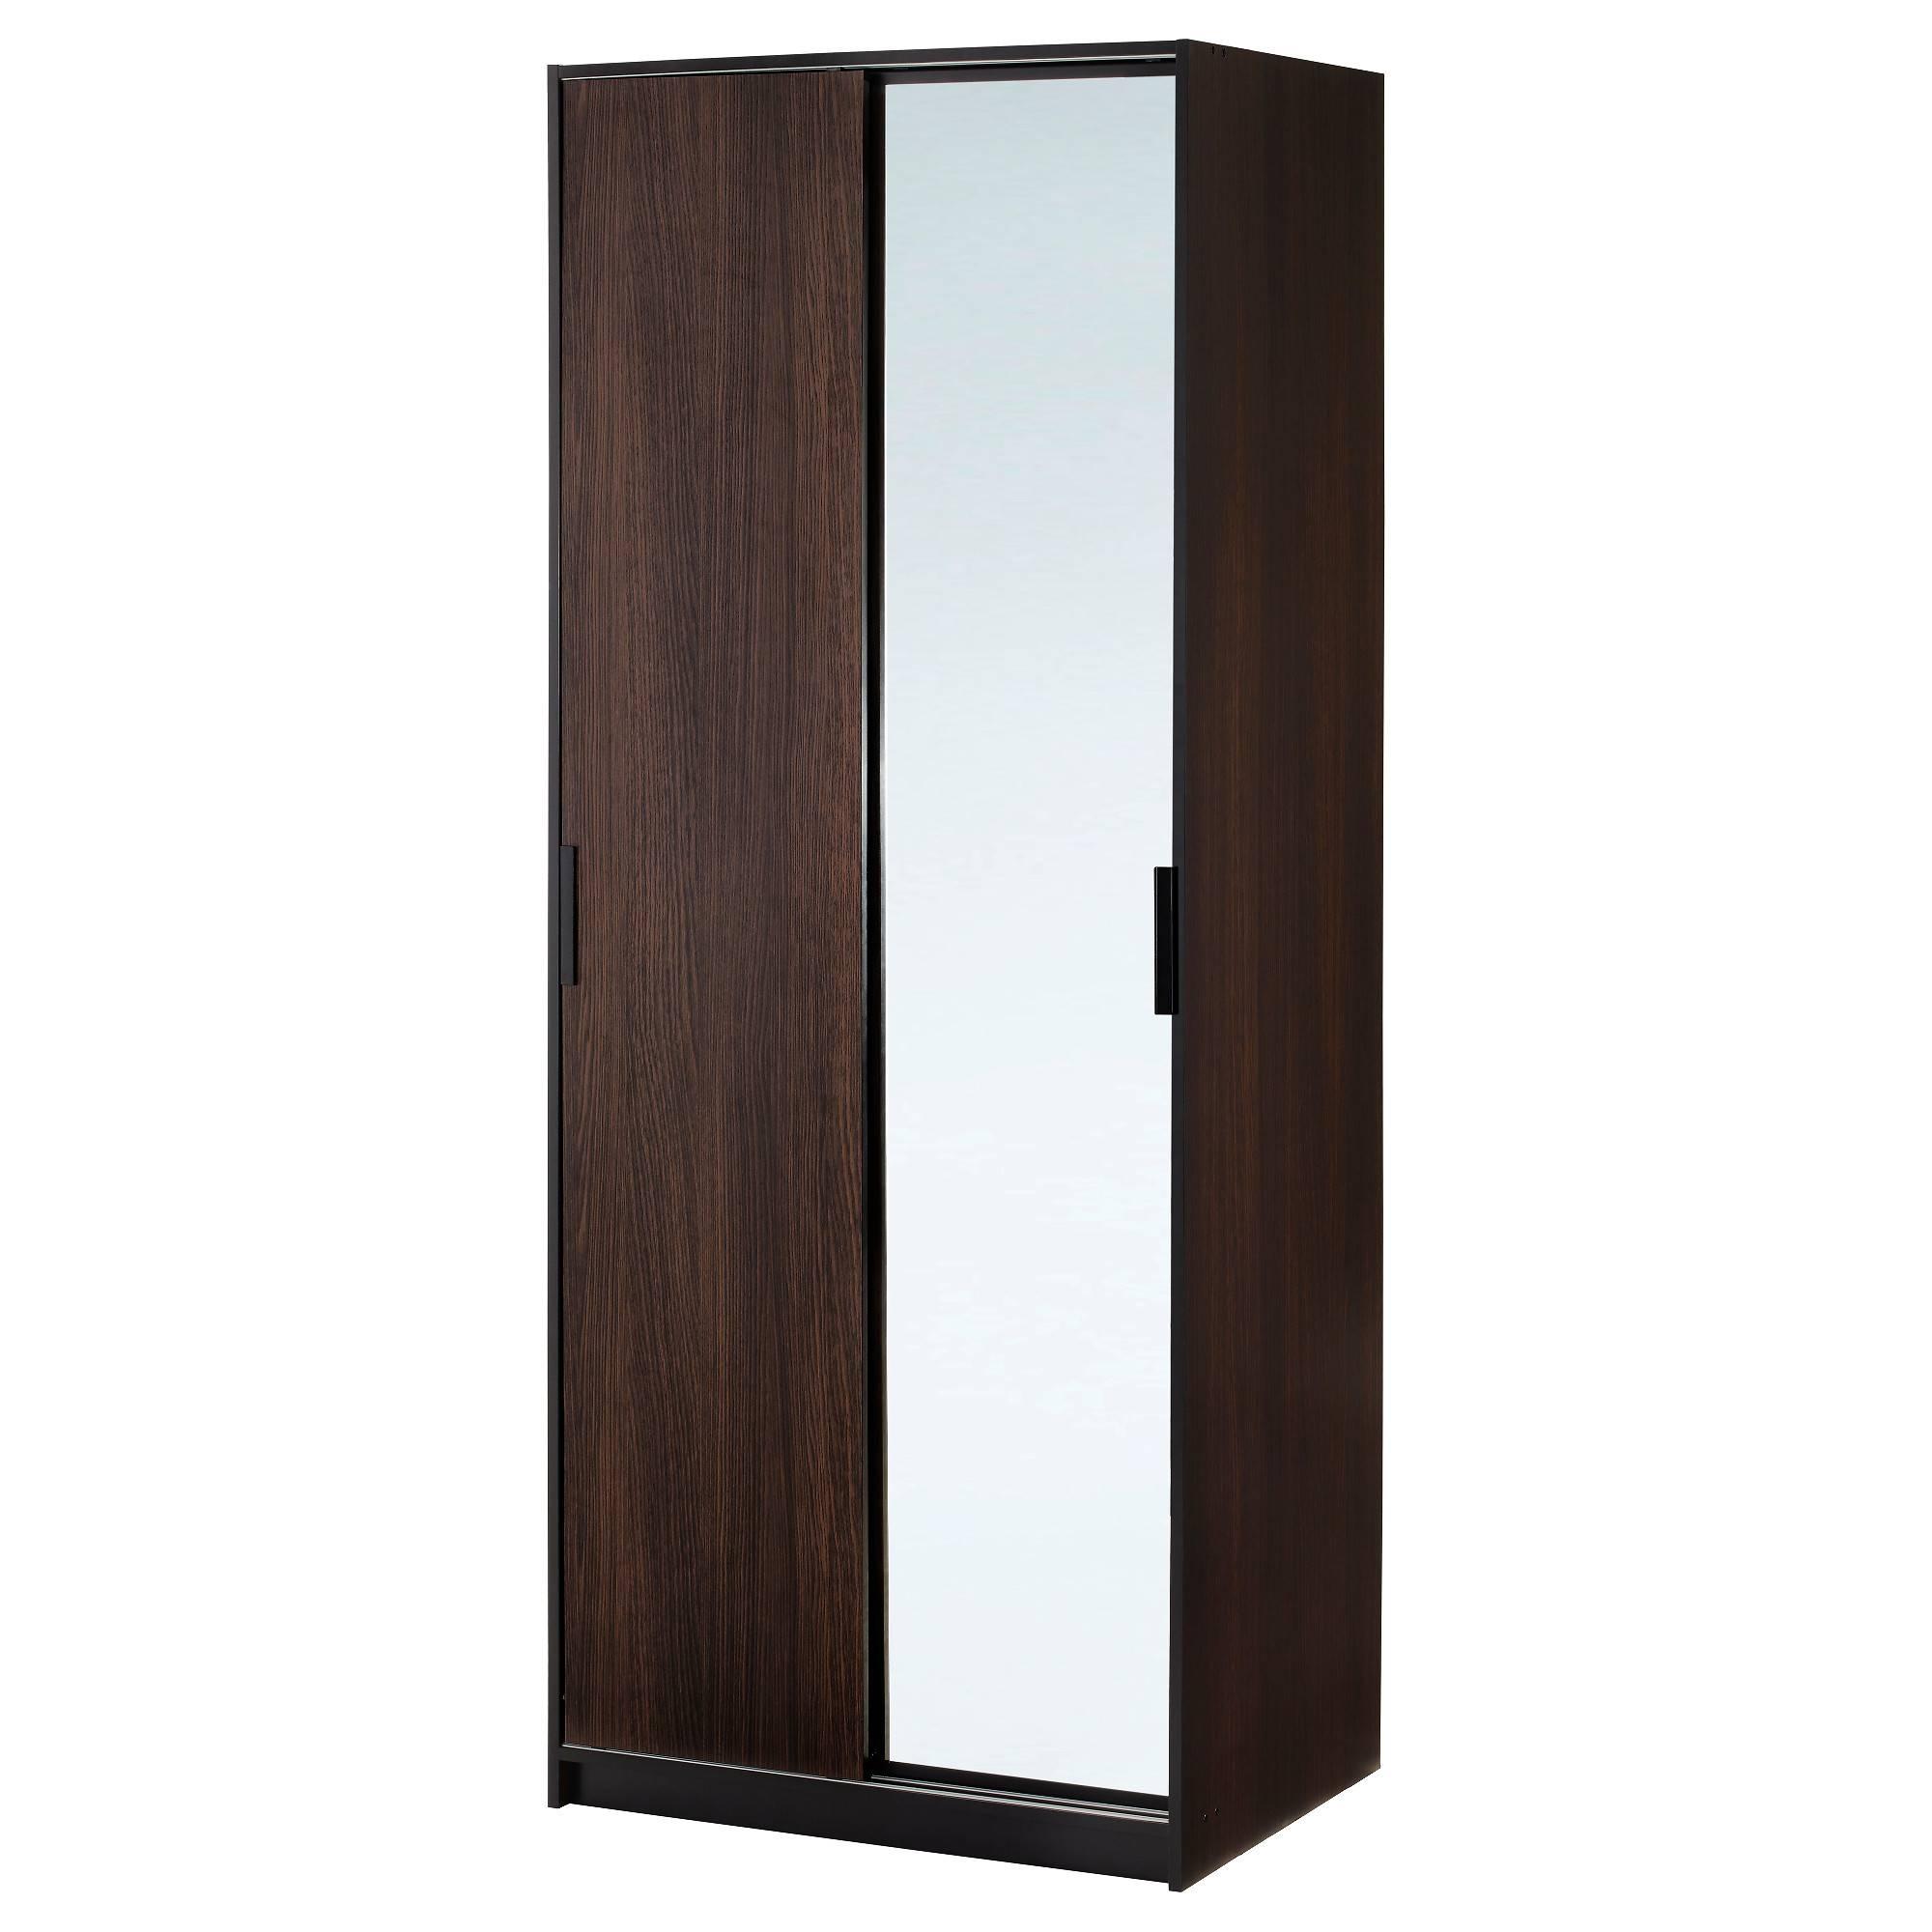 Wardrobes & Armoires – Open, Fitted, Sliding Doors & More – Ikea Regarding Cheap 2 Door Wardrobes (View 12 of 15)